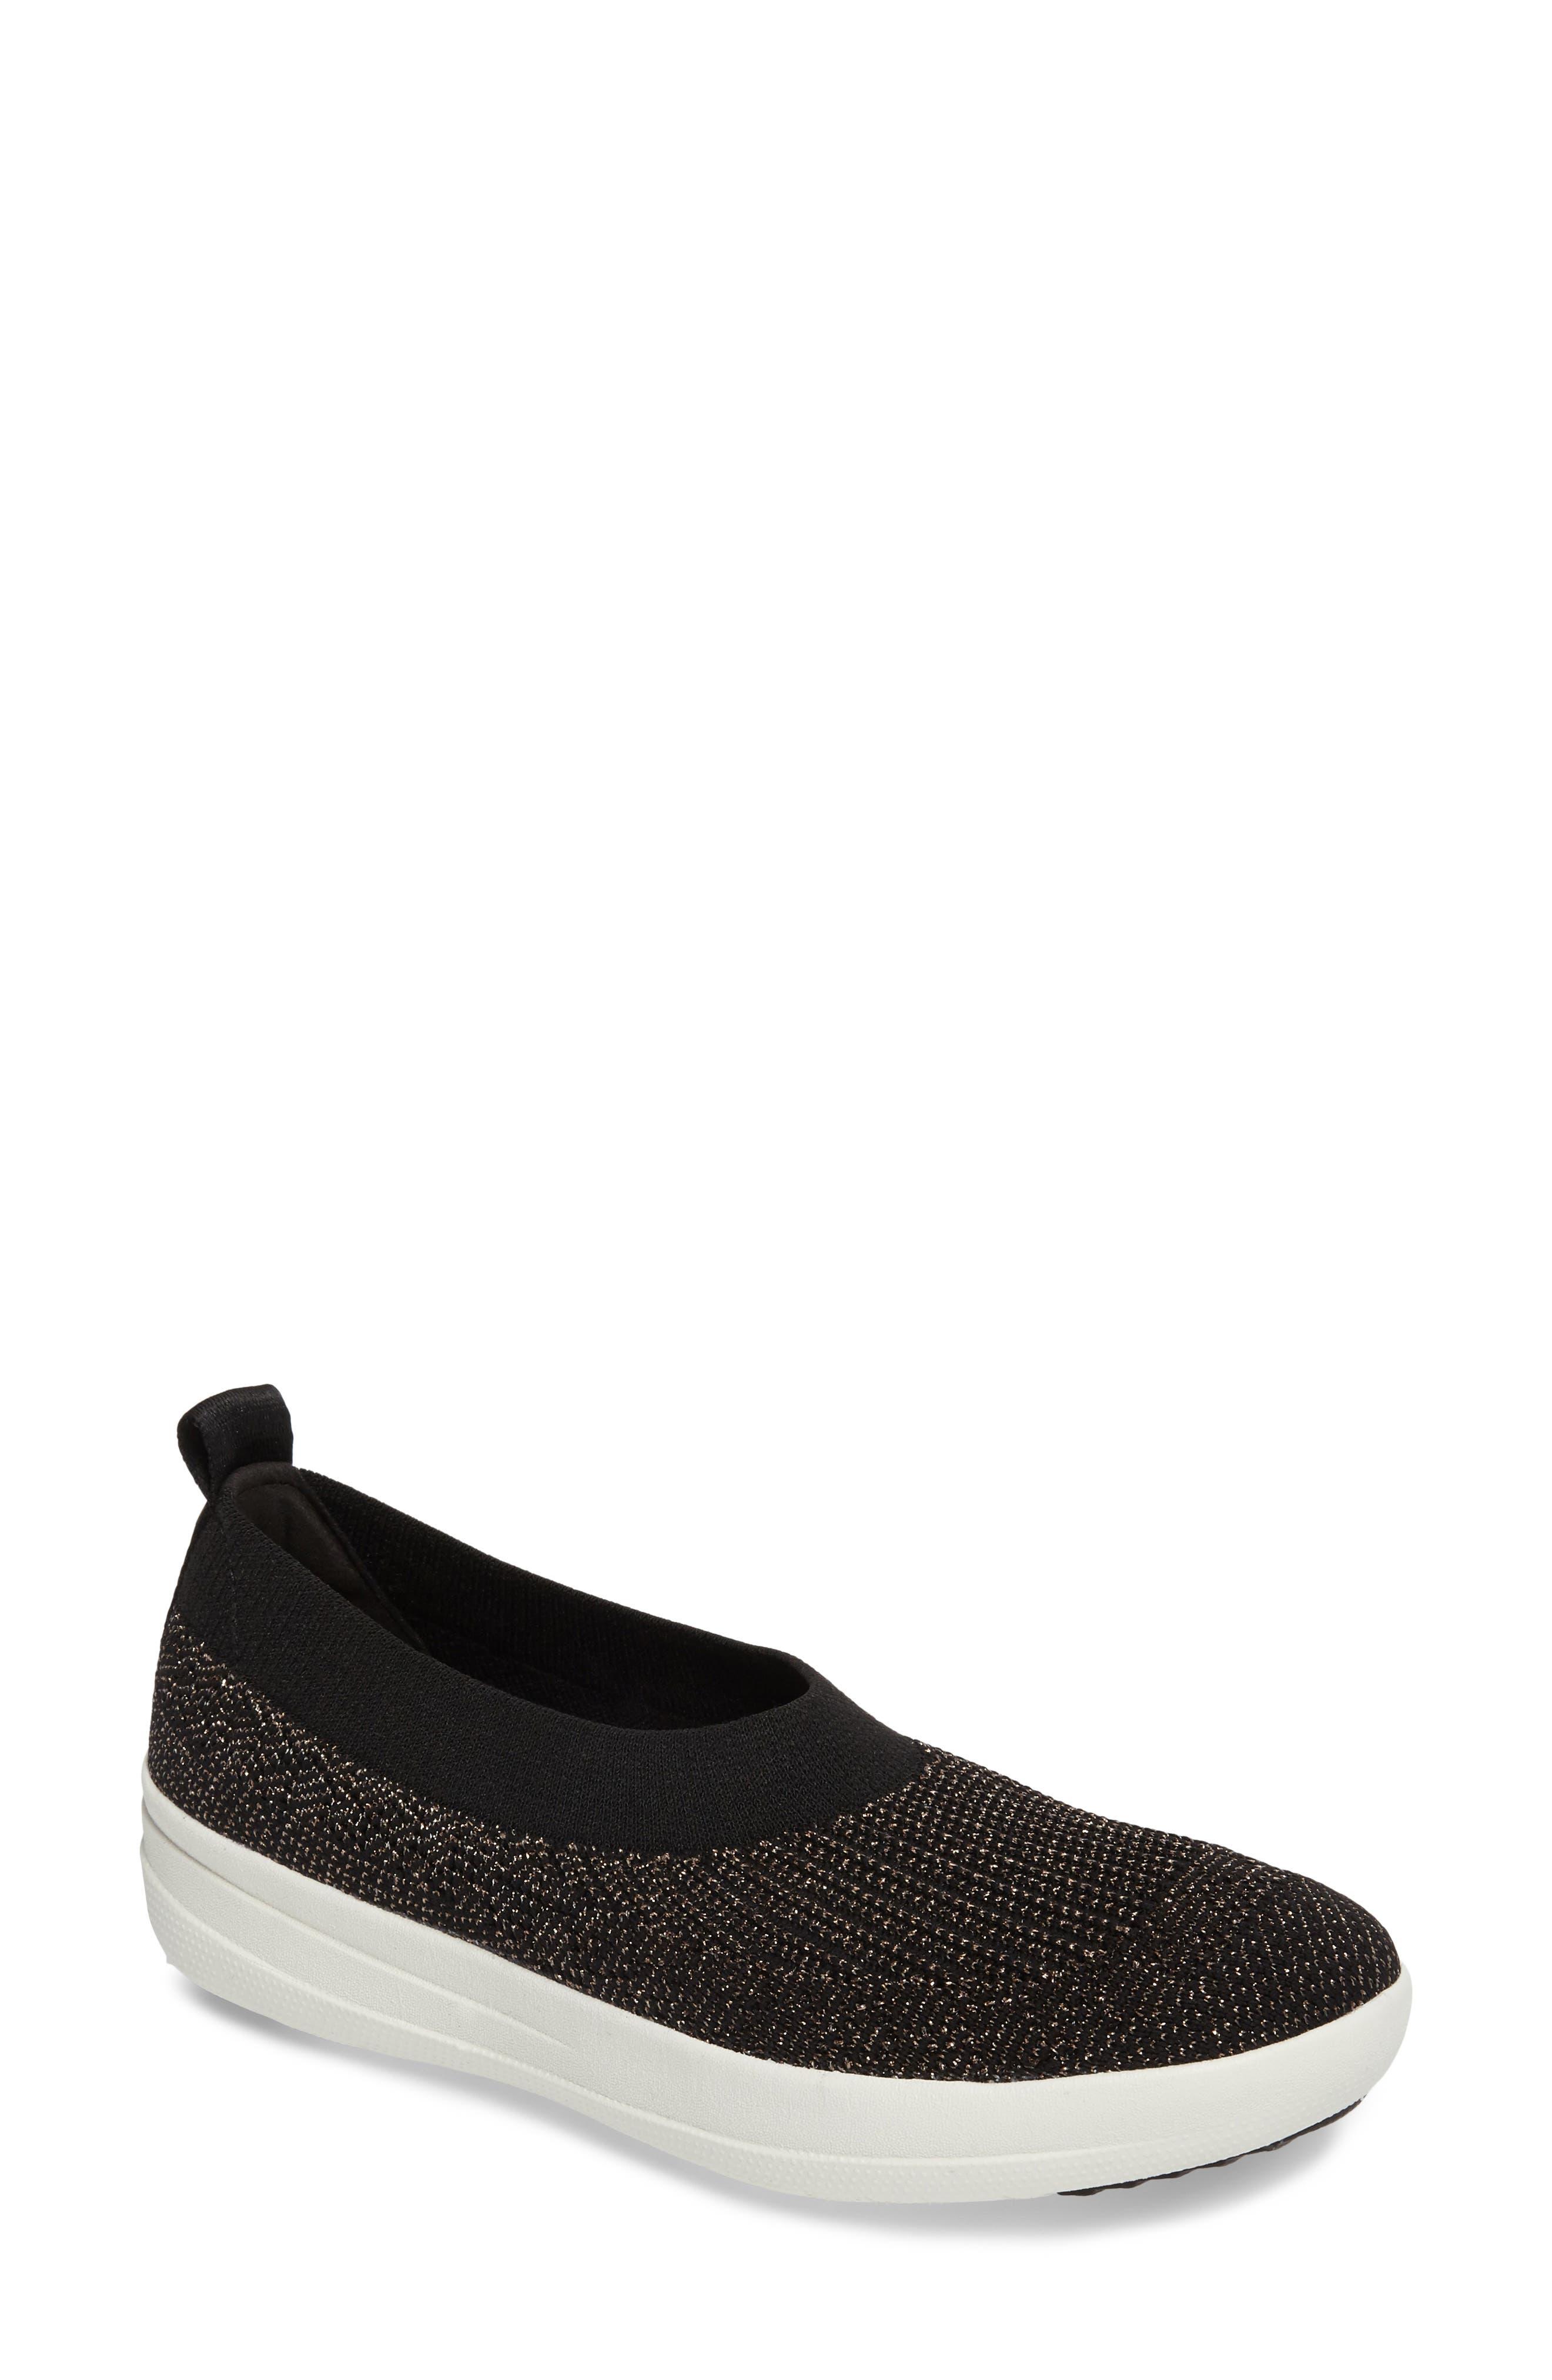 Uberknit<sup>™</sup> Slip-On Ballerina Sneaker,                         Main,                         color, 001